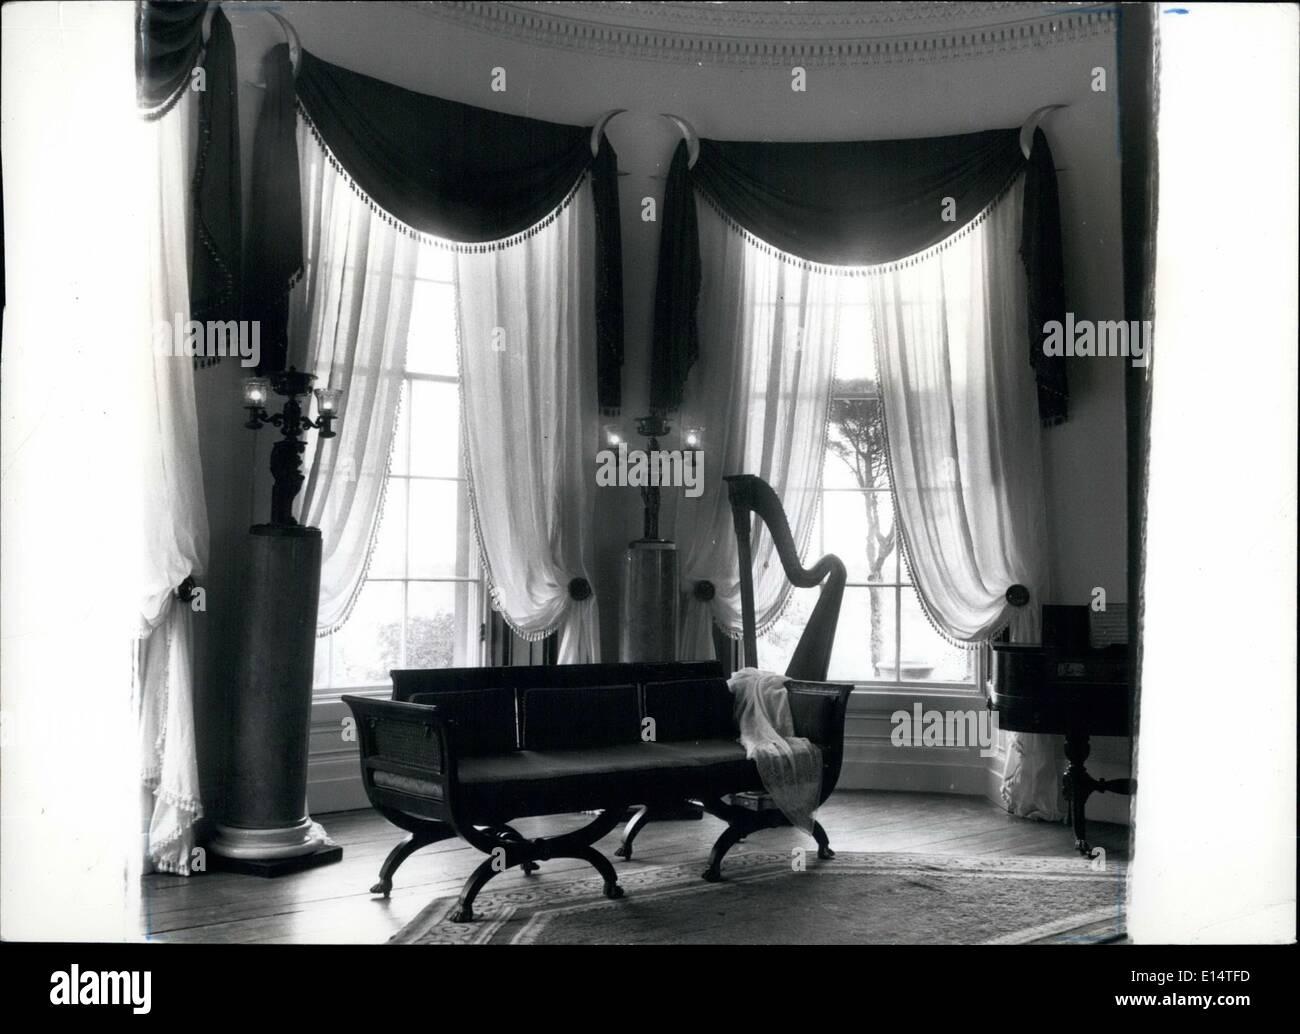 18. April 2012 - elegante Zimmer im Stil Greek Revival in Amerika im frühen 19. Jahrhundert populär. Ein Stockbild